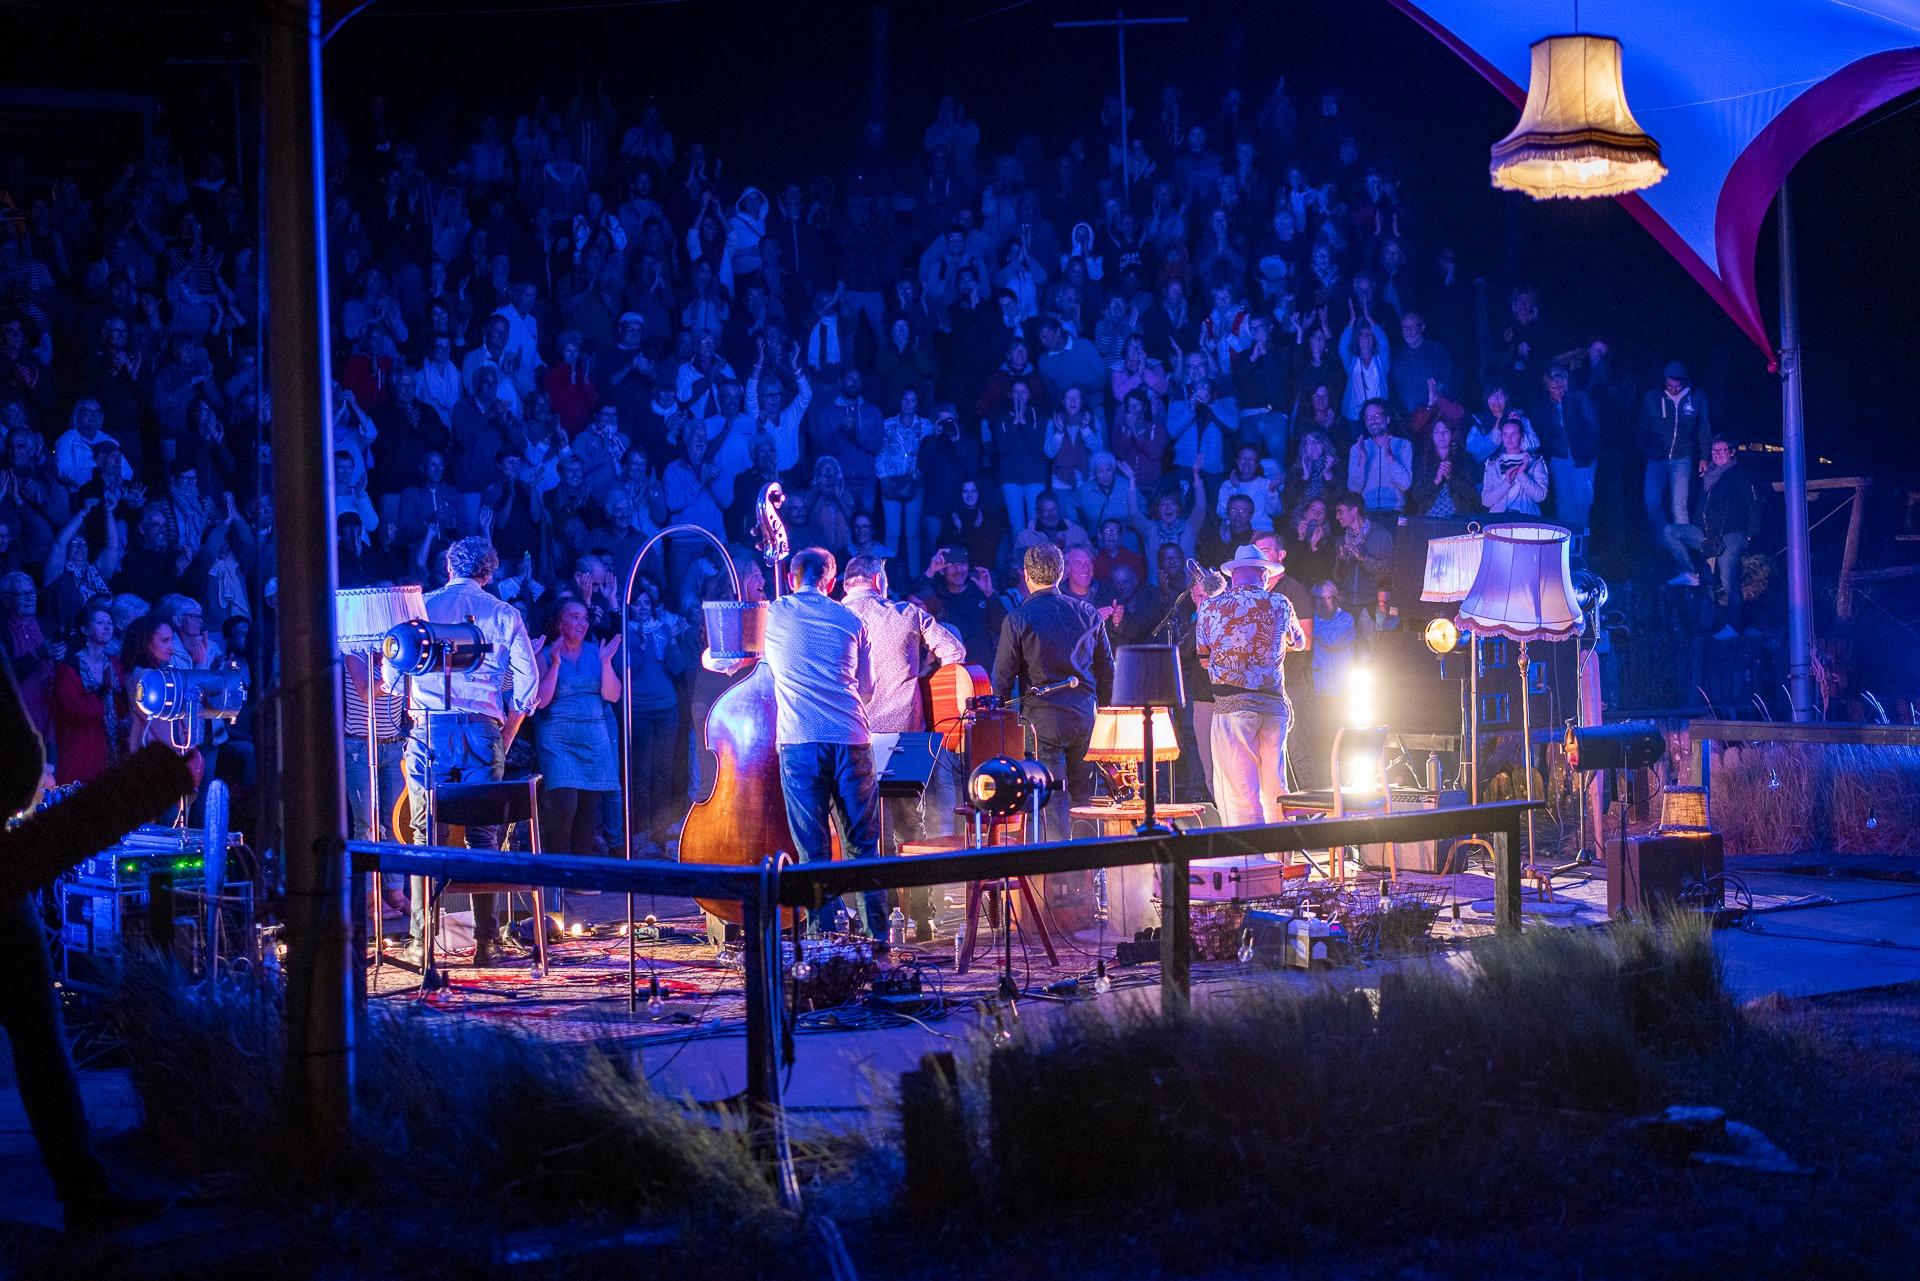 Public de Swing d'O en concert avec Sanseverino